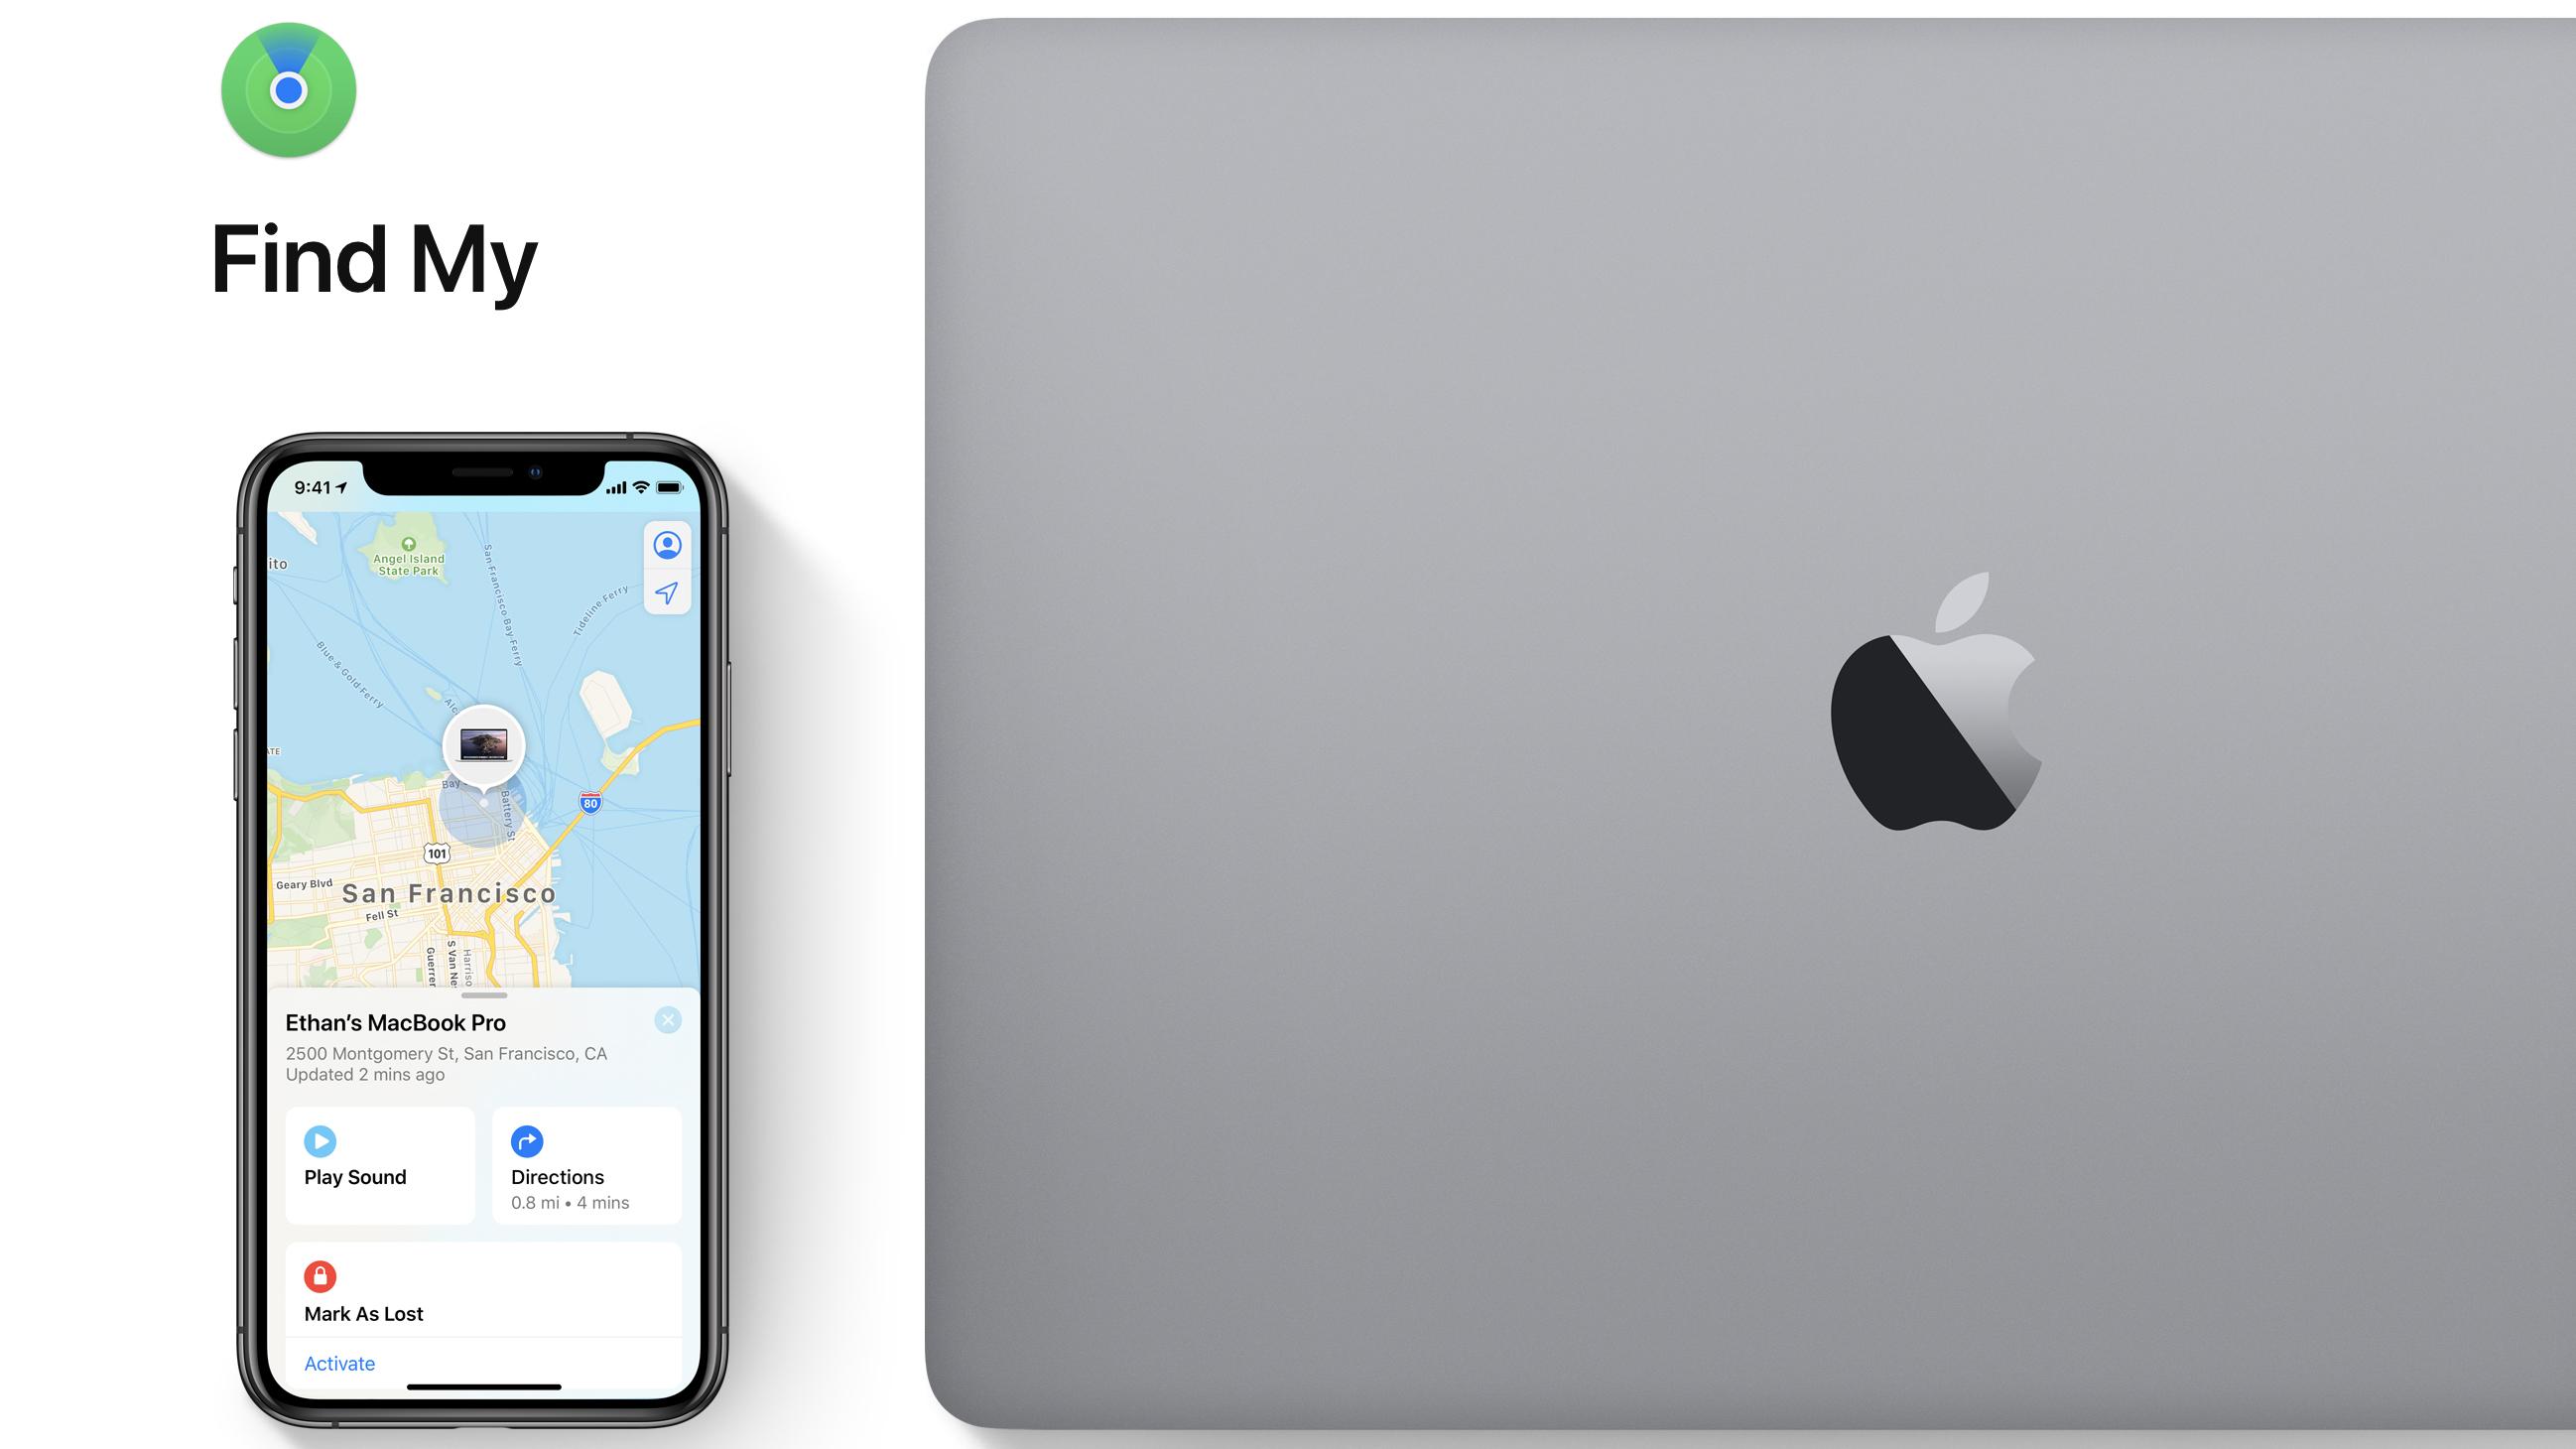 iOS 13 Find My app